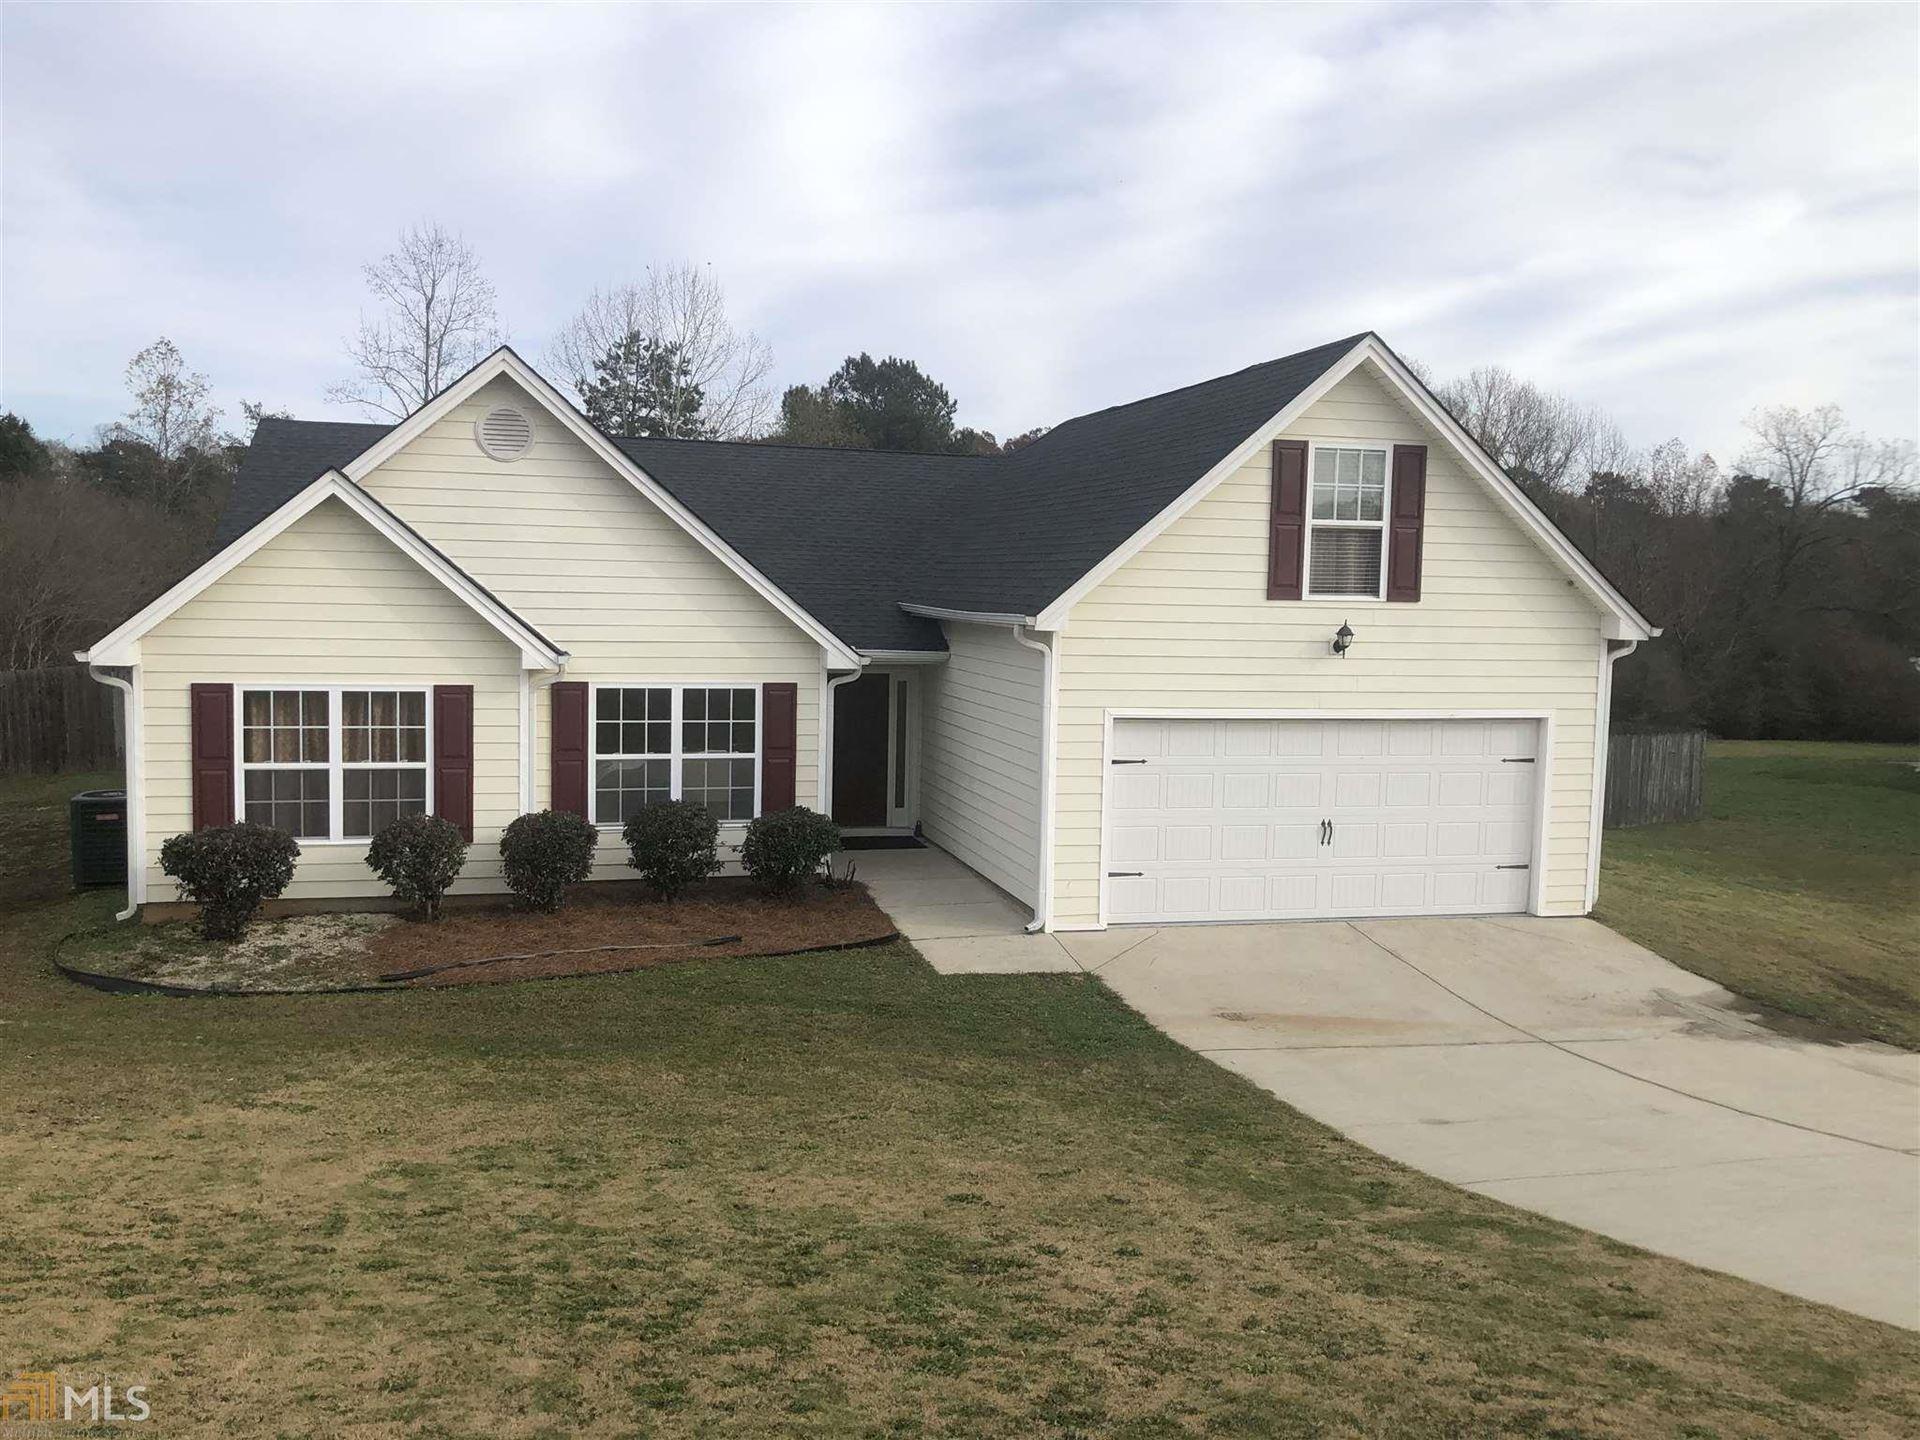 1416 Flanagan Mill, Auburn, GA 30011 - #: 8894662